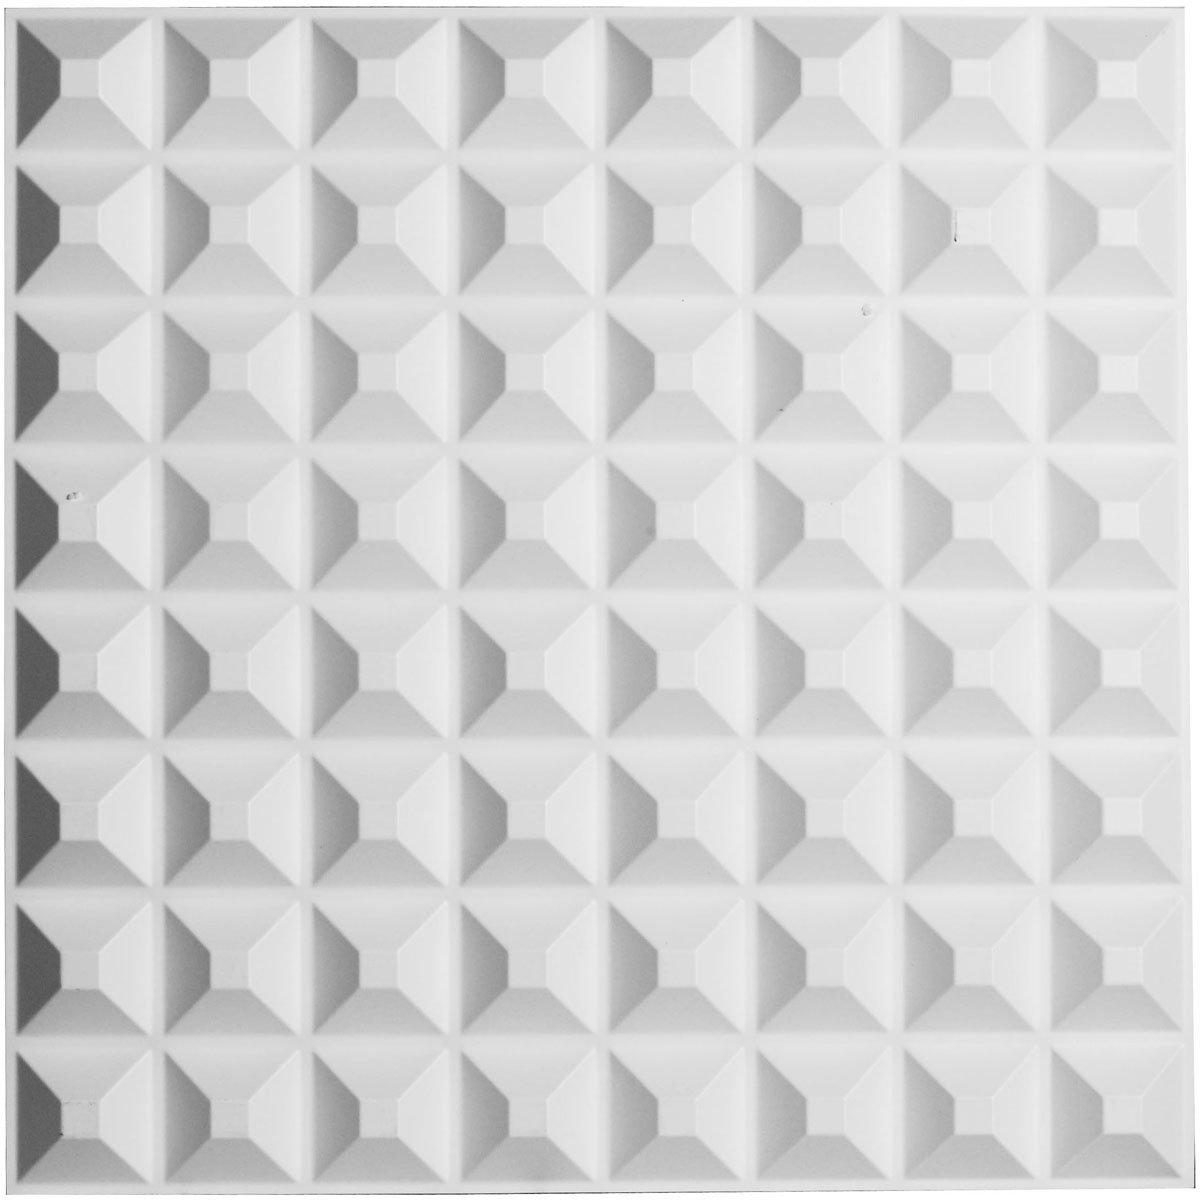 Ekena Millwork WP20X20BRWH Bradford Design Decorative 3D Wall Panel White